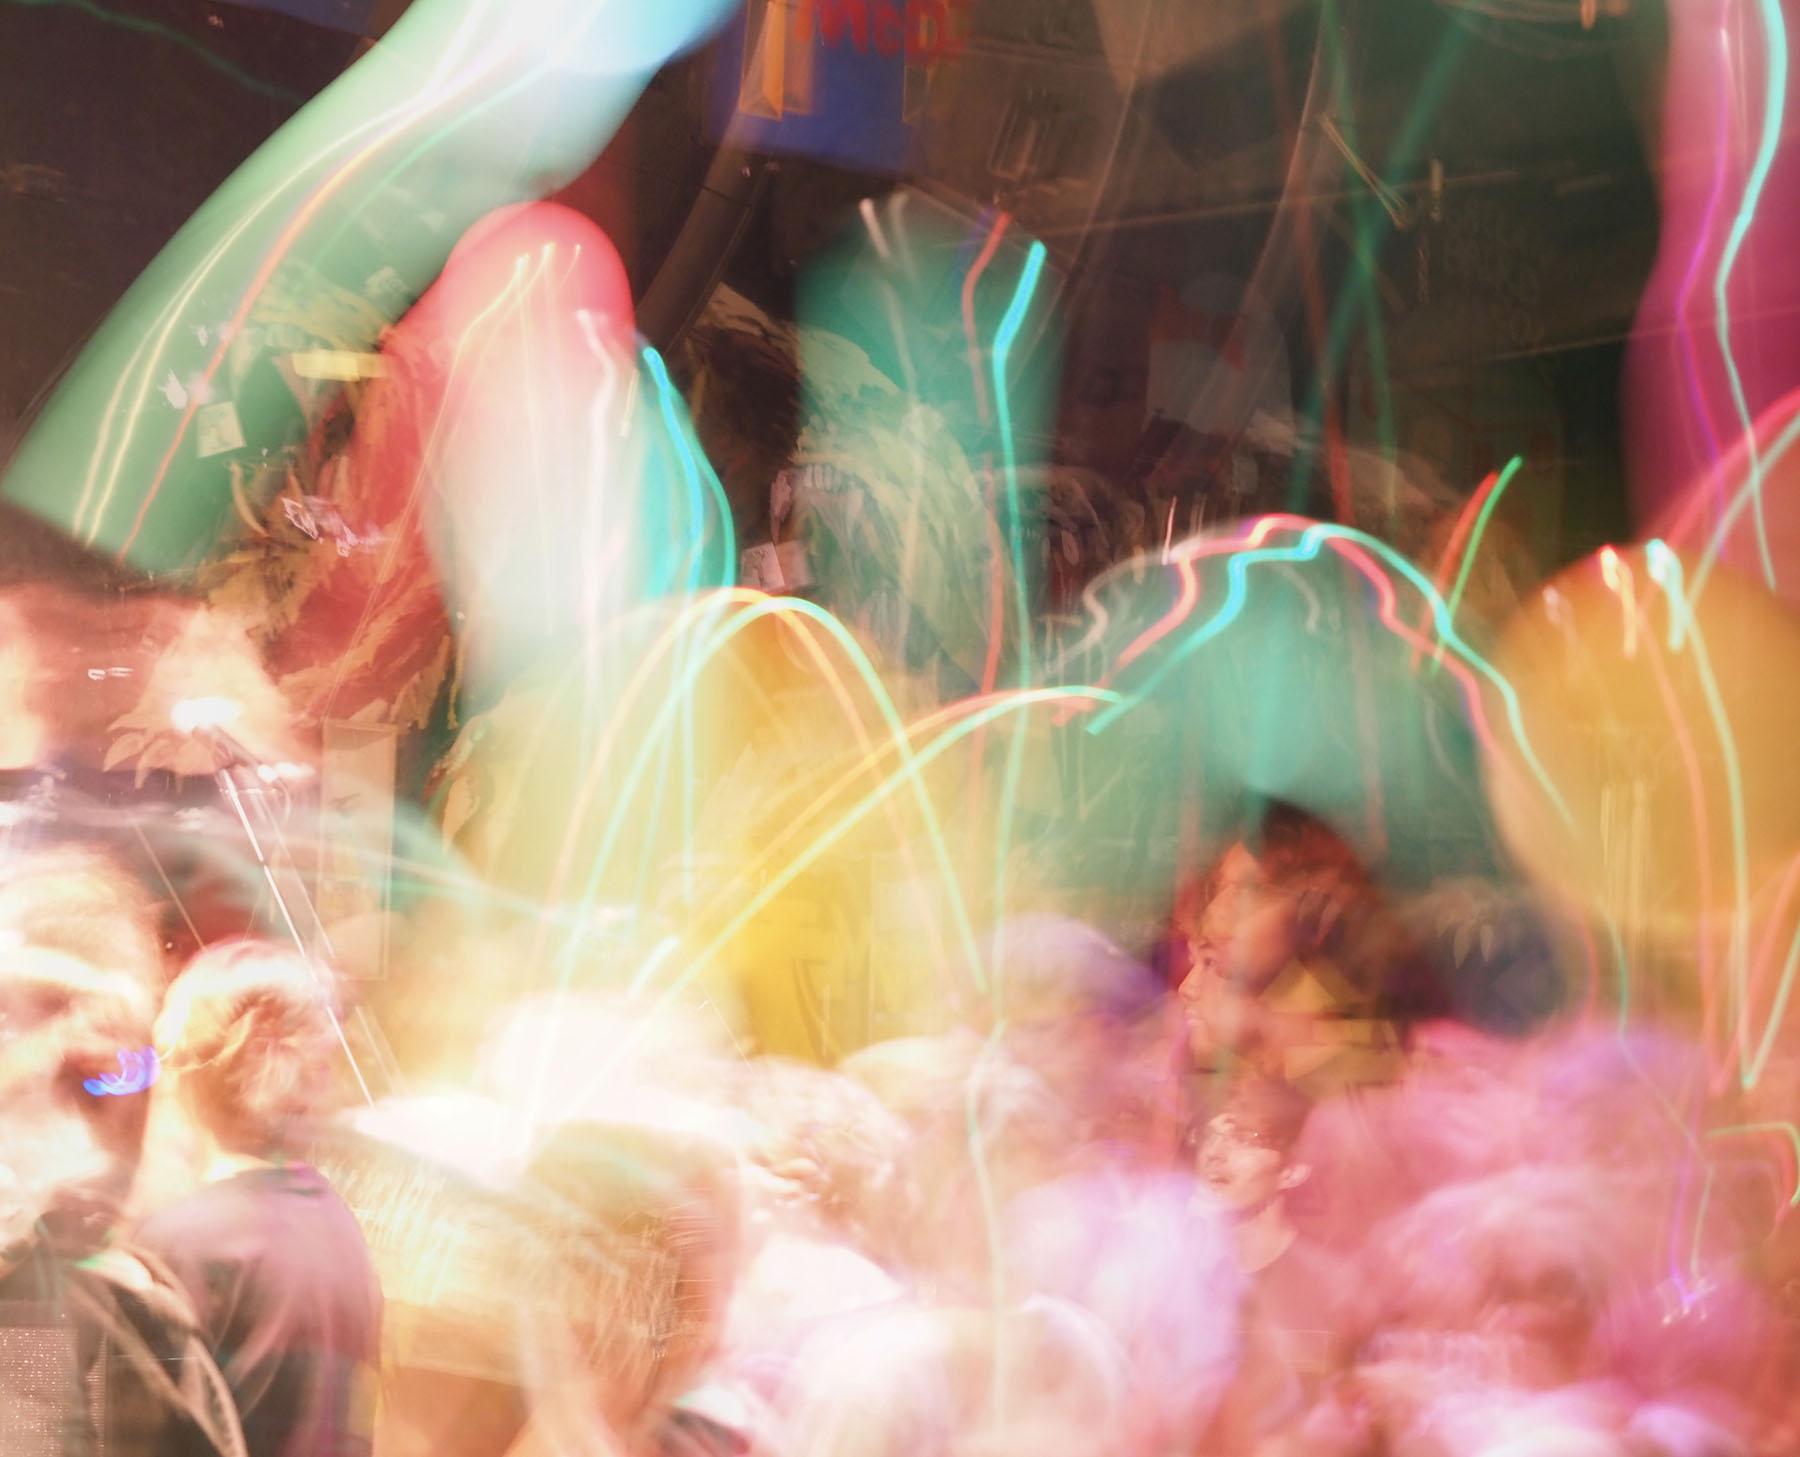 Amanda_Rittenhouse_Let's Dance.jpg